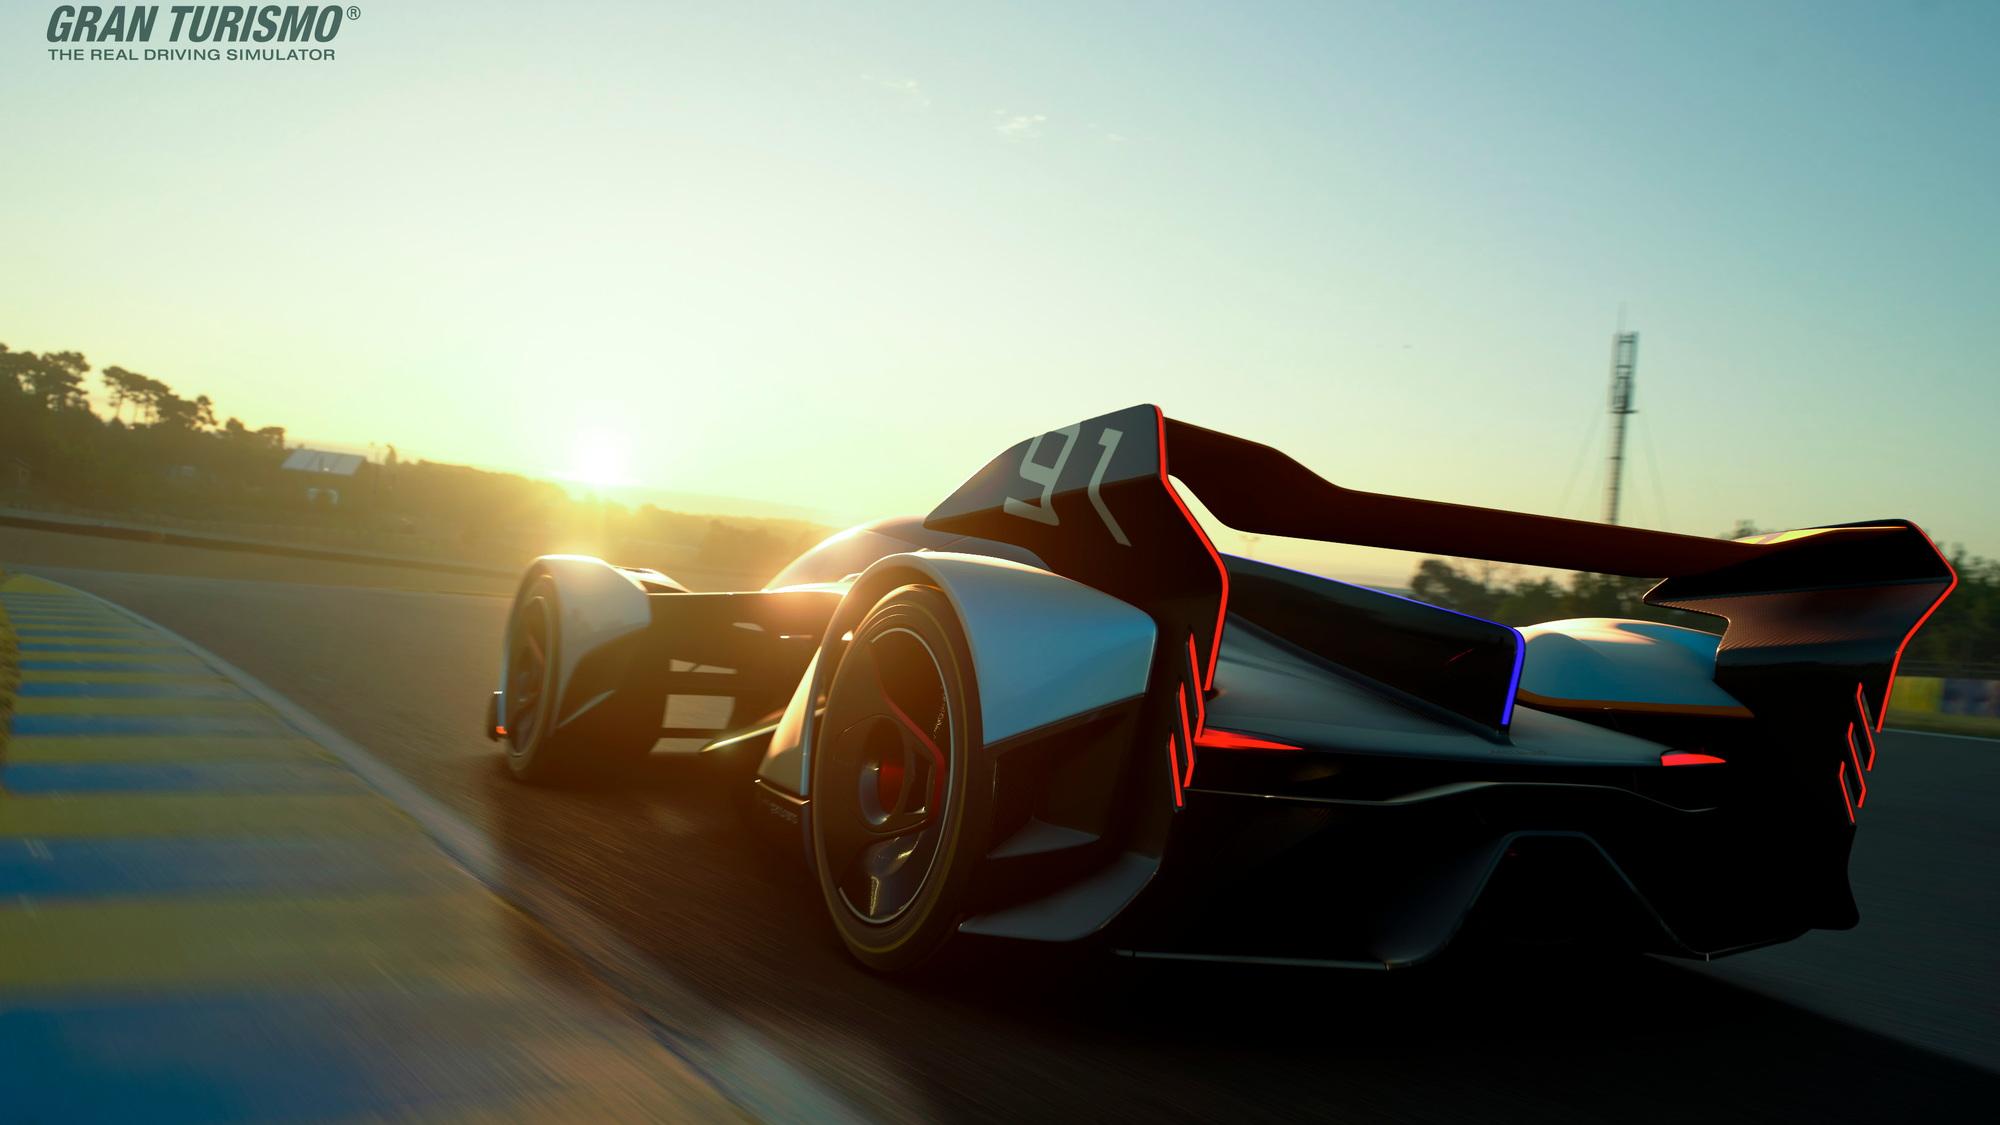 McLaren Ultimate Vision GT virtual concept car